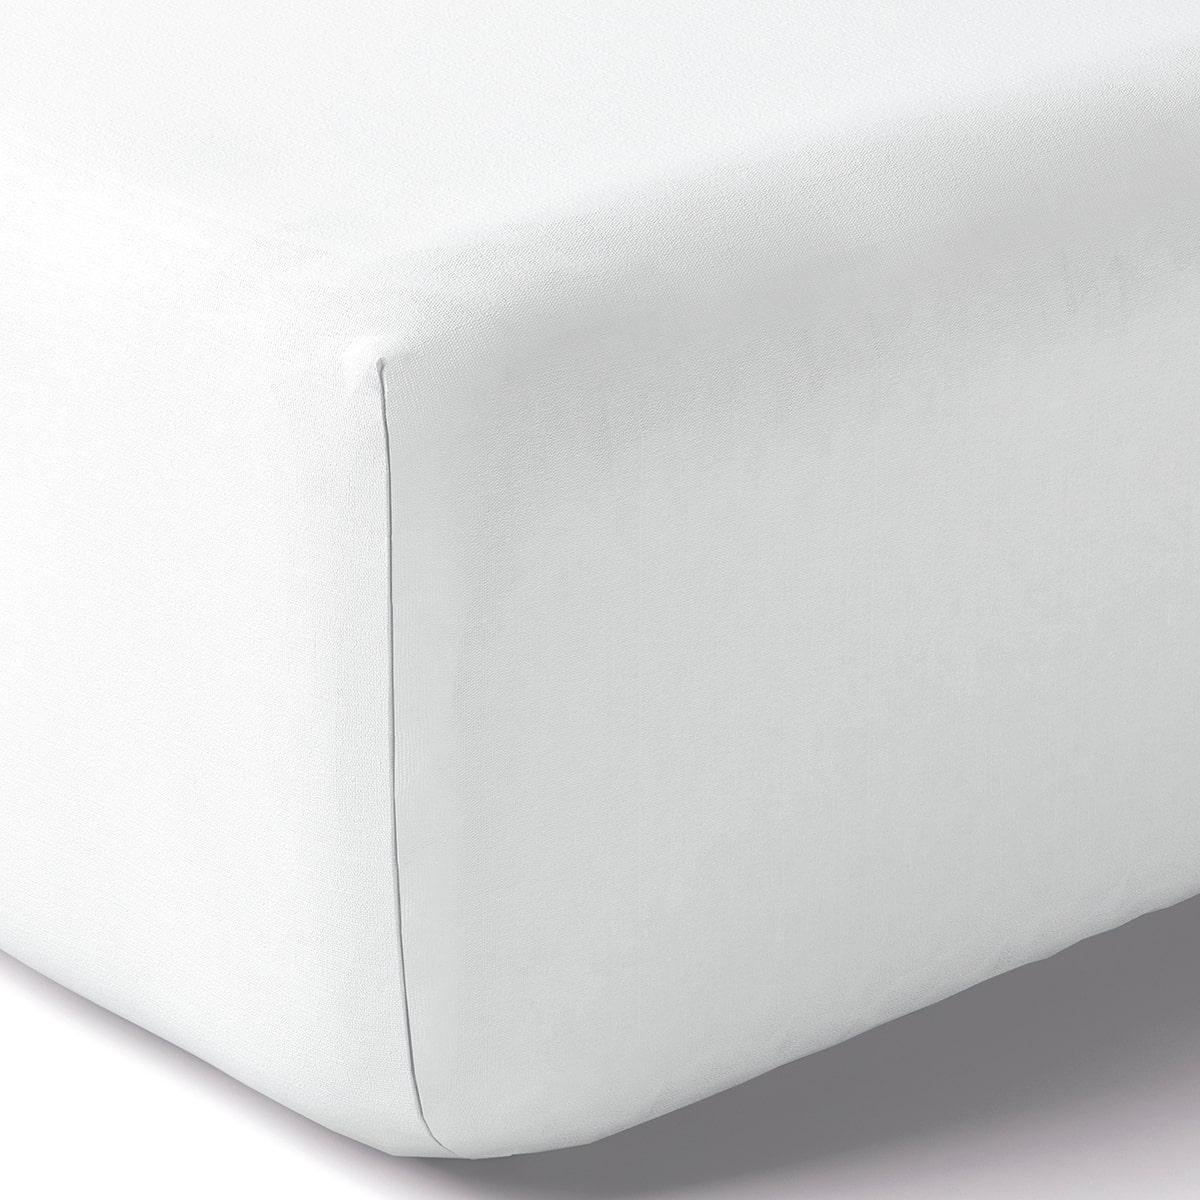 Drap housse coton 120x200 cm blanc